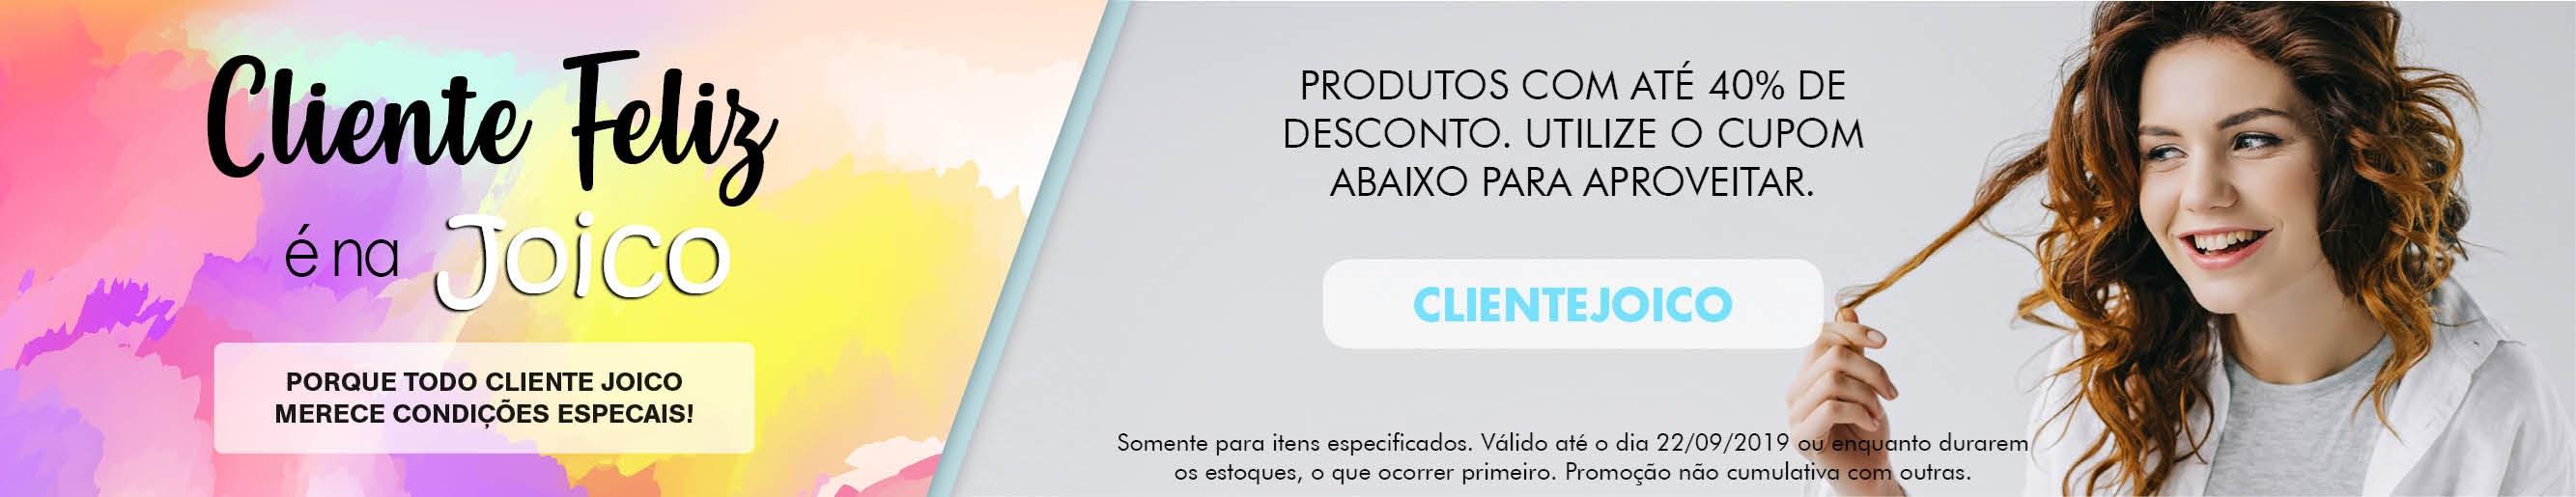 Cliente feliz é na Joico! Landing Page